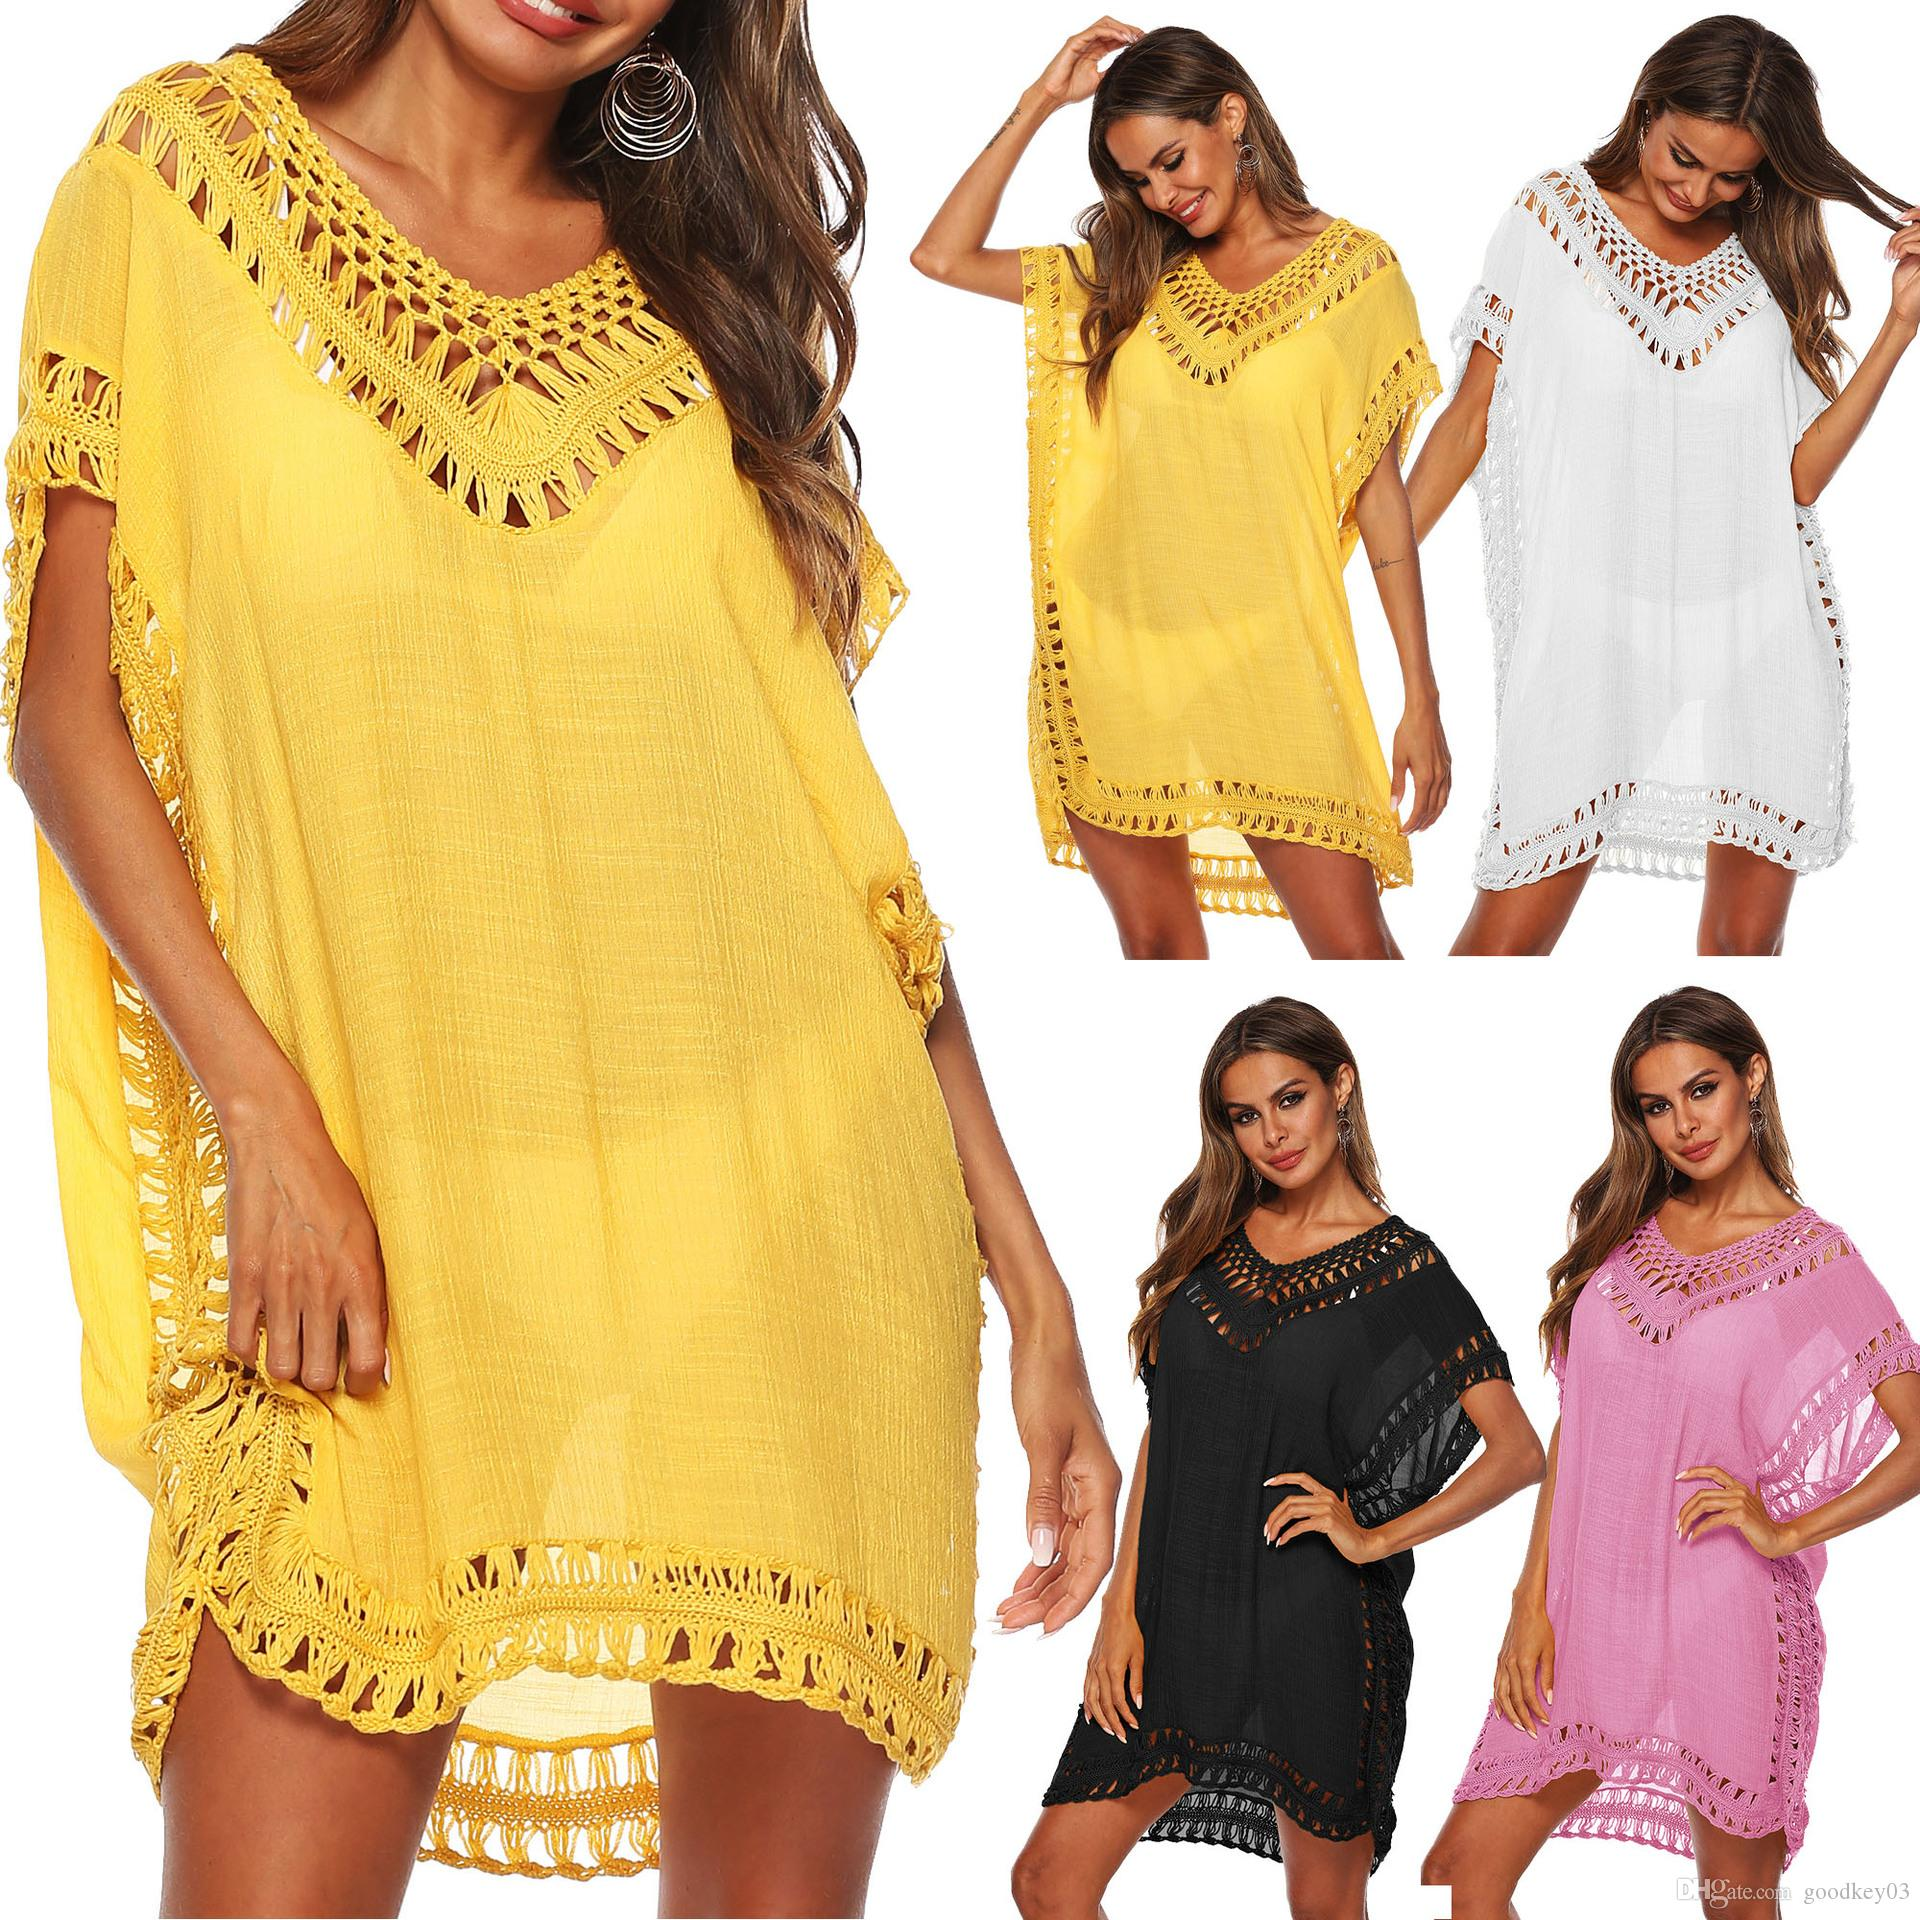 a4ba5c3281b6 2019 Kaftan Tunic Beach Dress 2019 Lady Bikini Swim Wear Summer Swimsuit  Cover Up Boho White Yellow V Neck Dresses Neon Cover Ups From Goodkey03, ...